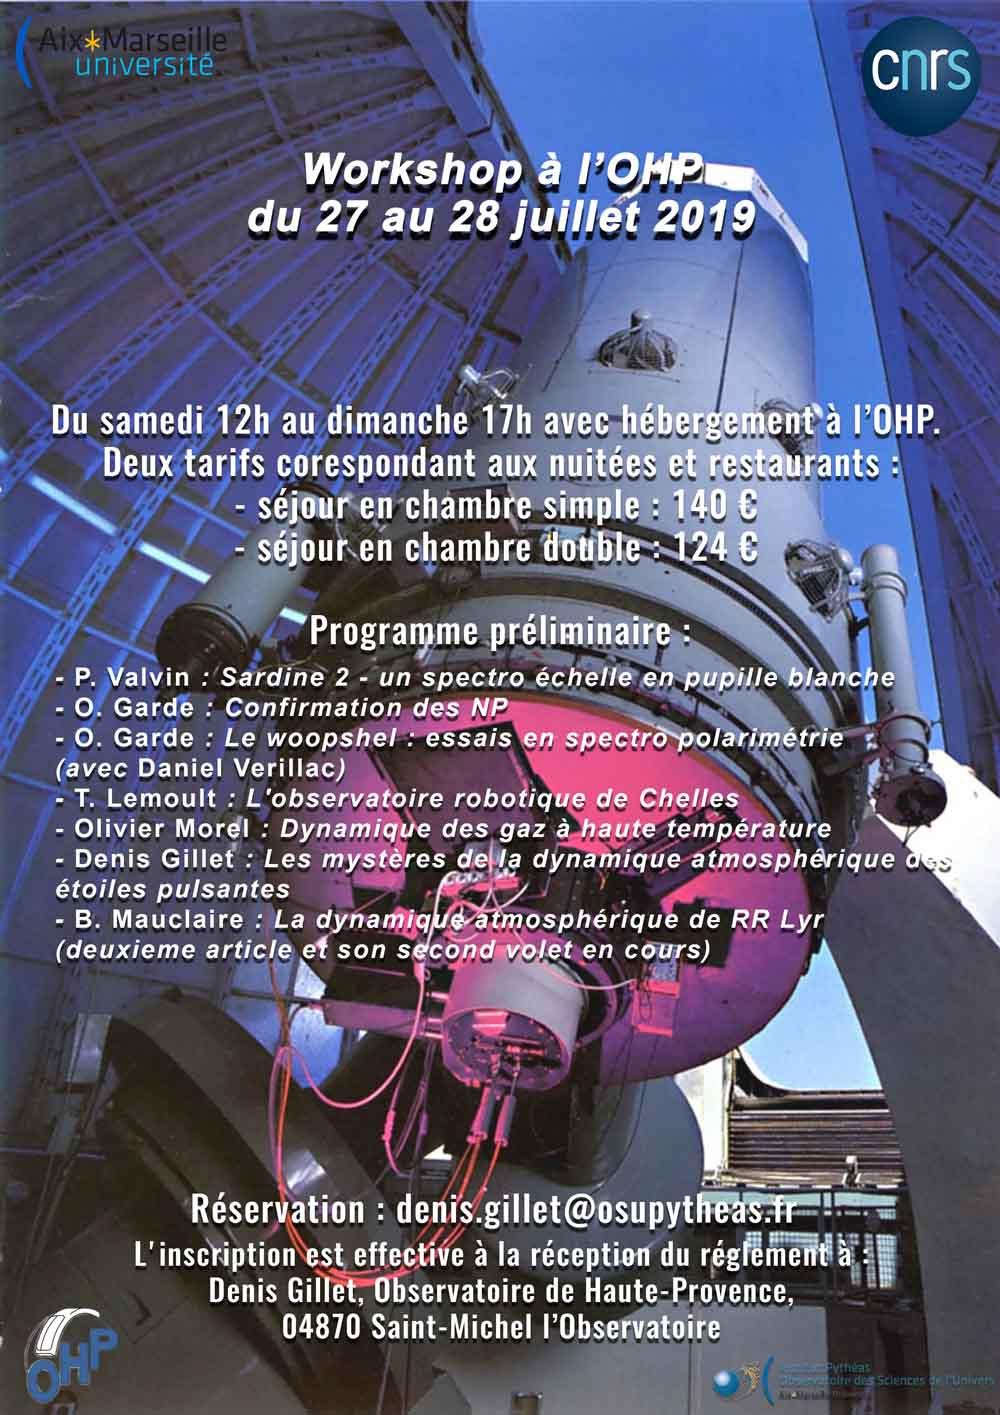 2019_workshop_GRRR_programmescsc.jpg.6a2291917ecf7c21db45773bac56904c.jpg